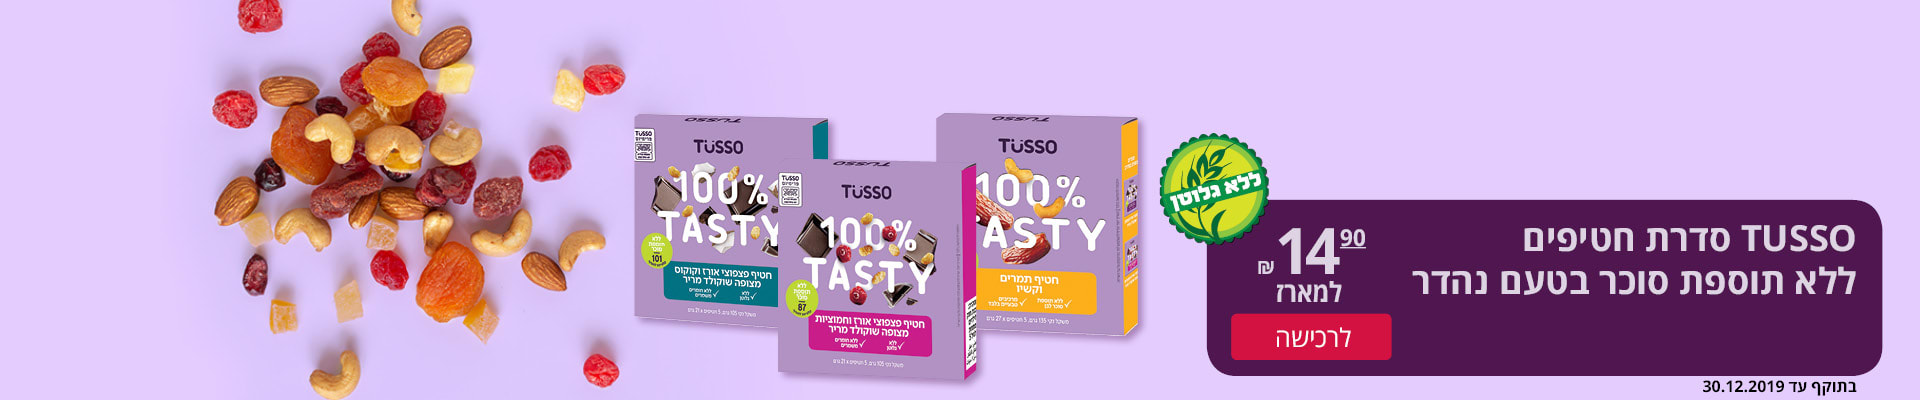 TUSSO סדרת חטיפים ללא תוספת סוכר בטעם נהדר ב- 14.90 למארז. בתוקף עד 30.12.2019